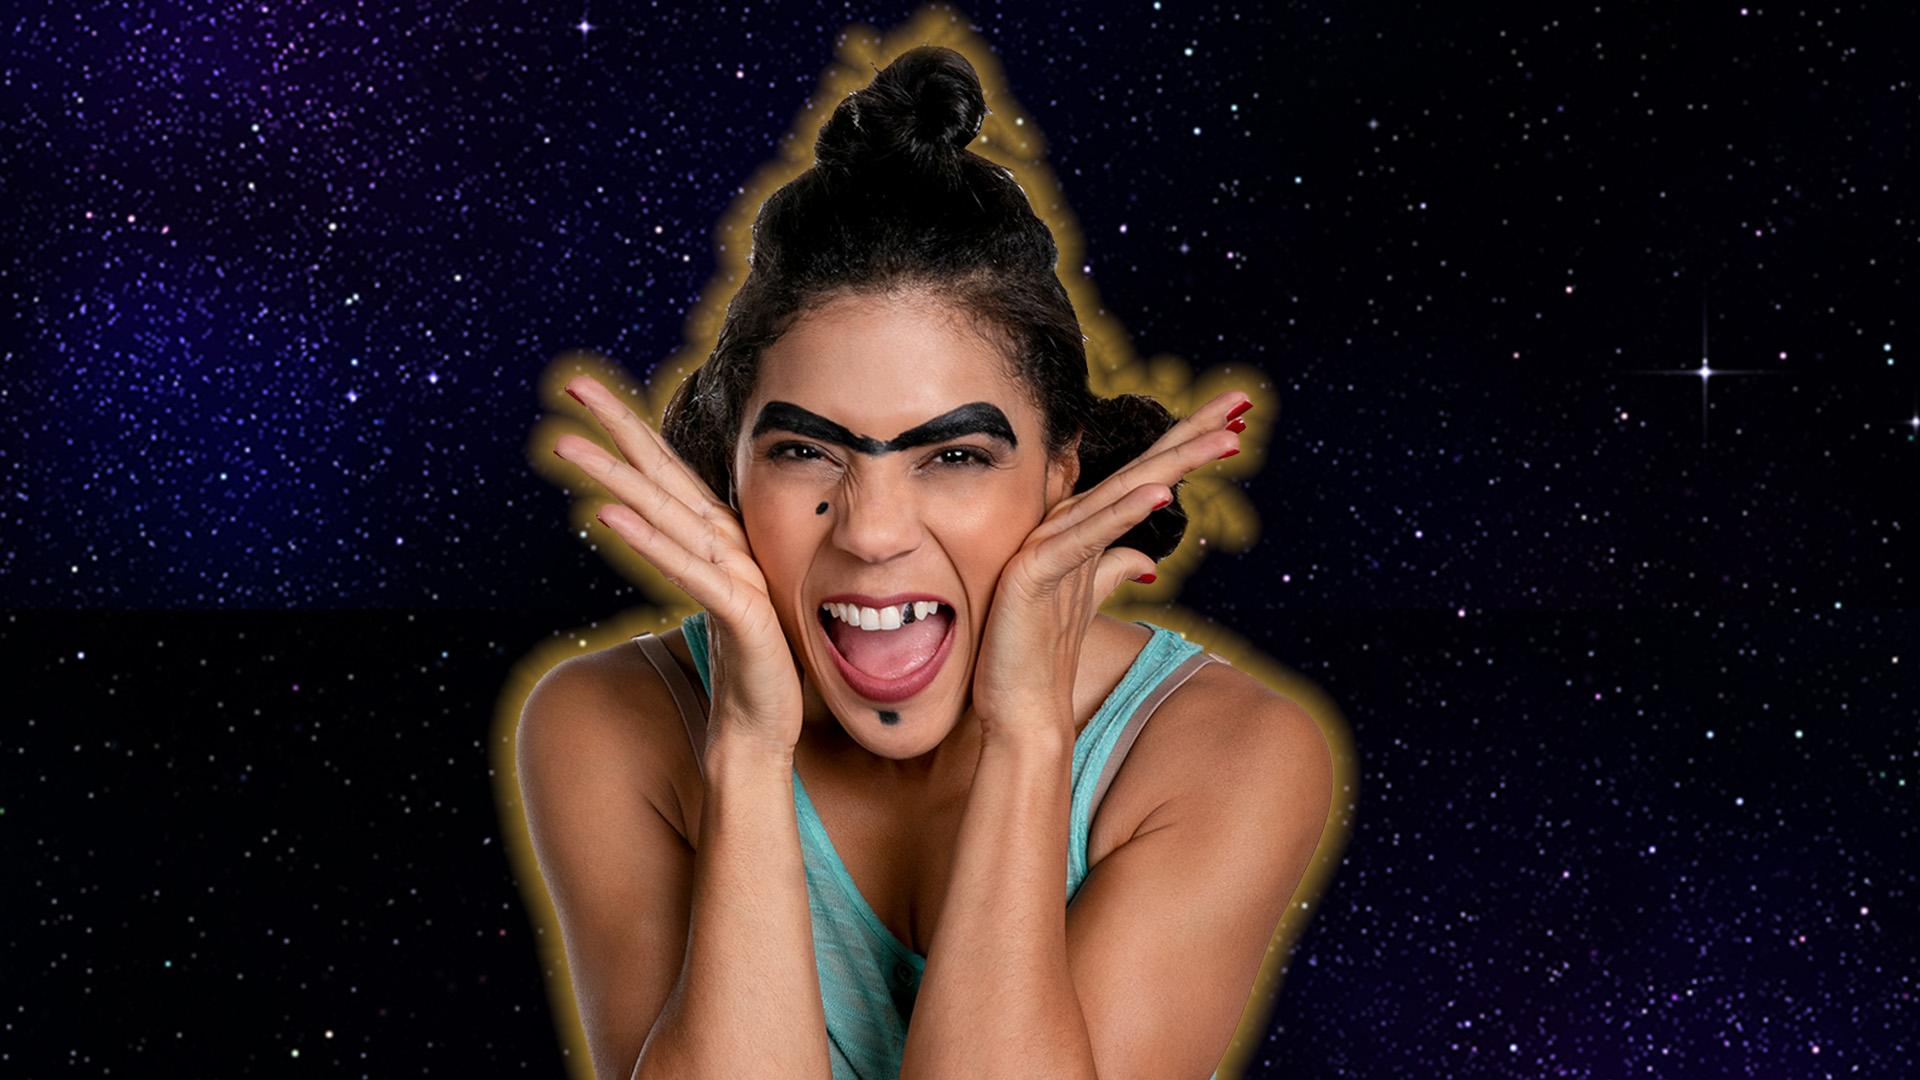 Mela La Melaza, puro humor a la Dominicana